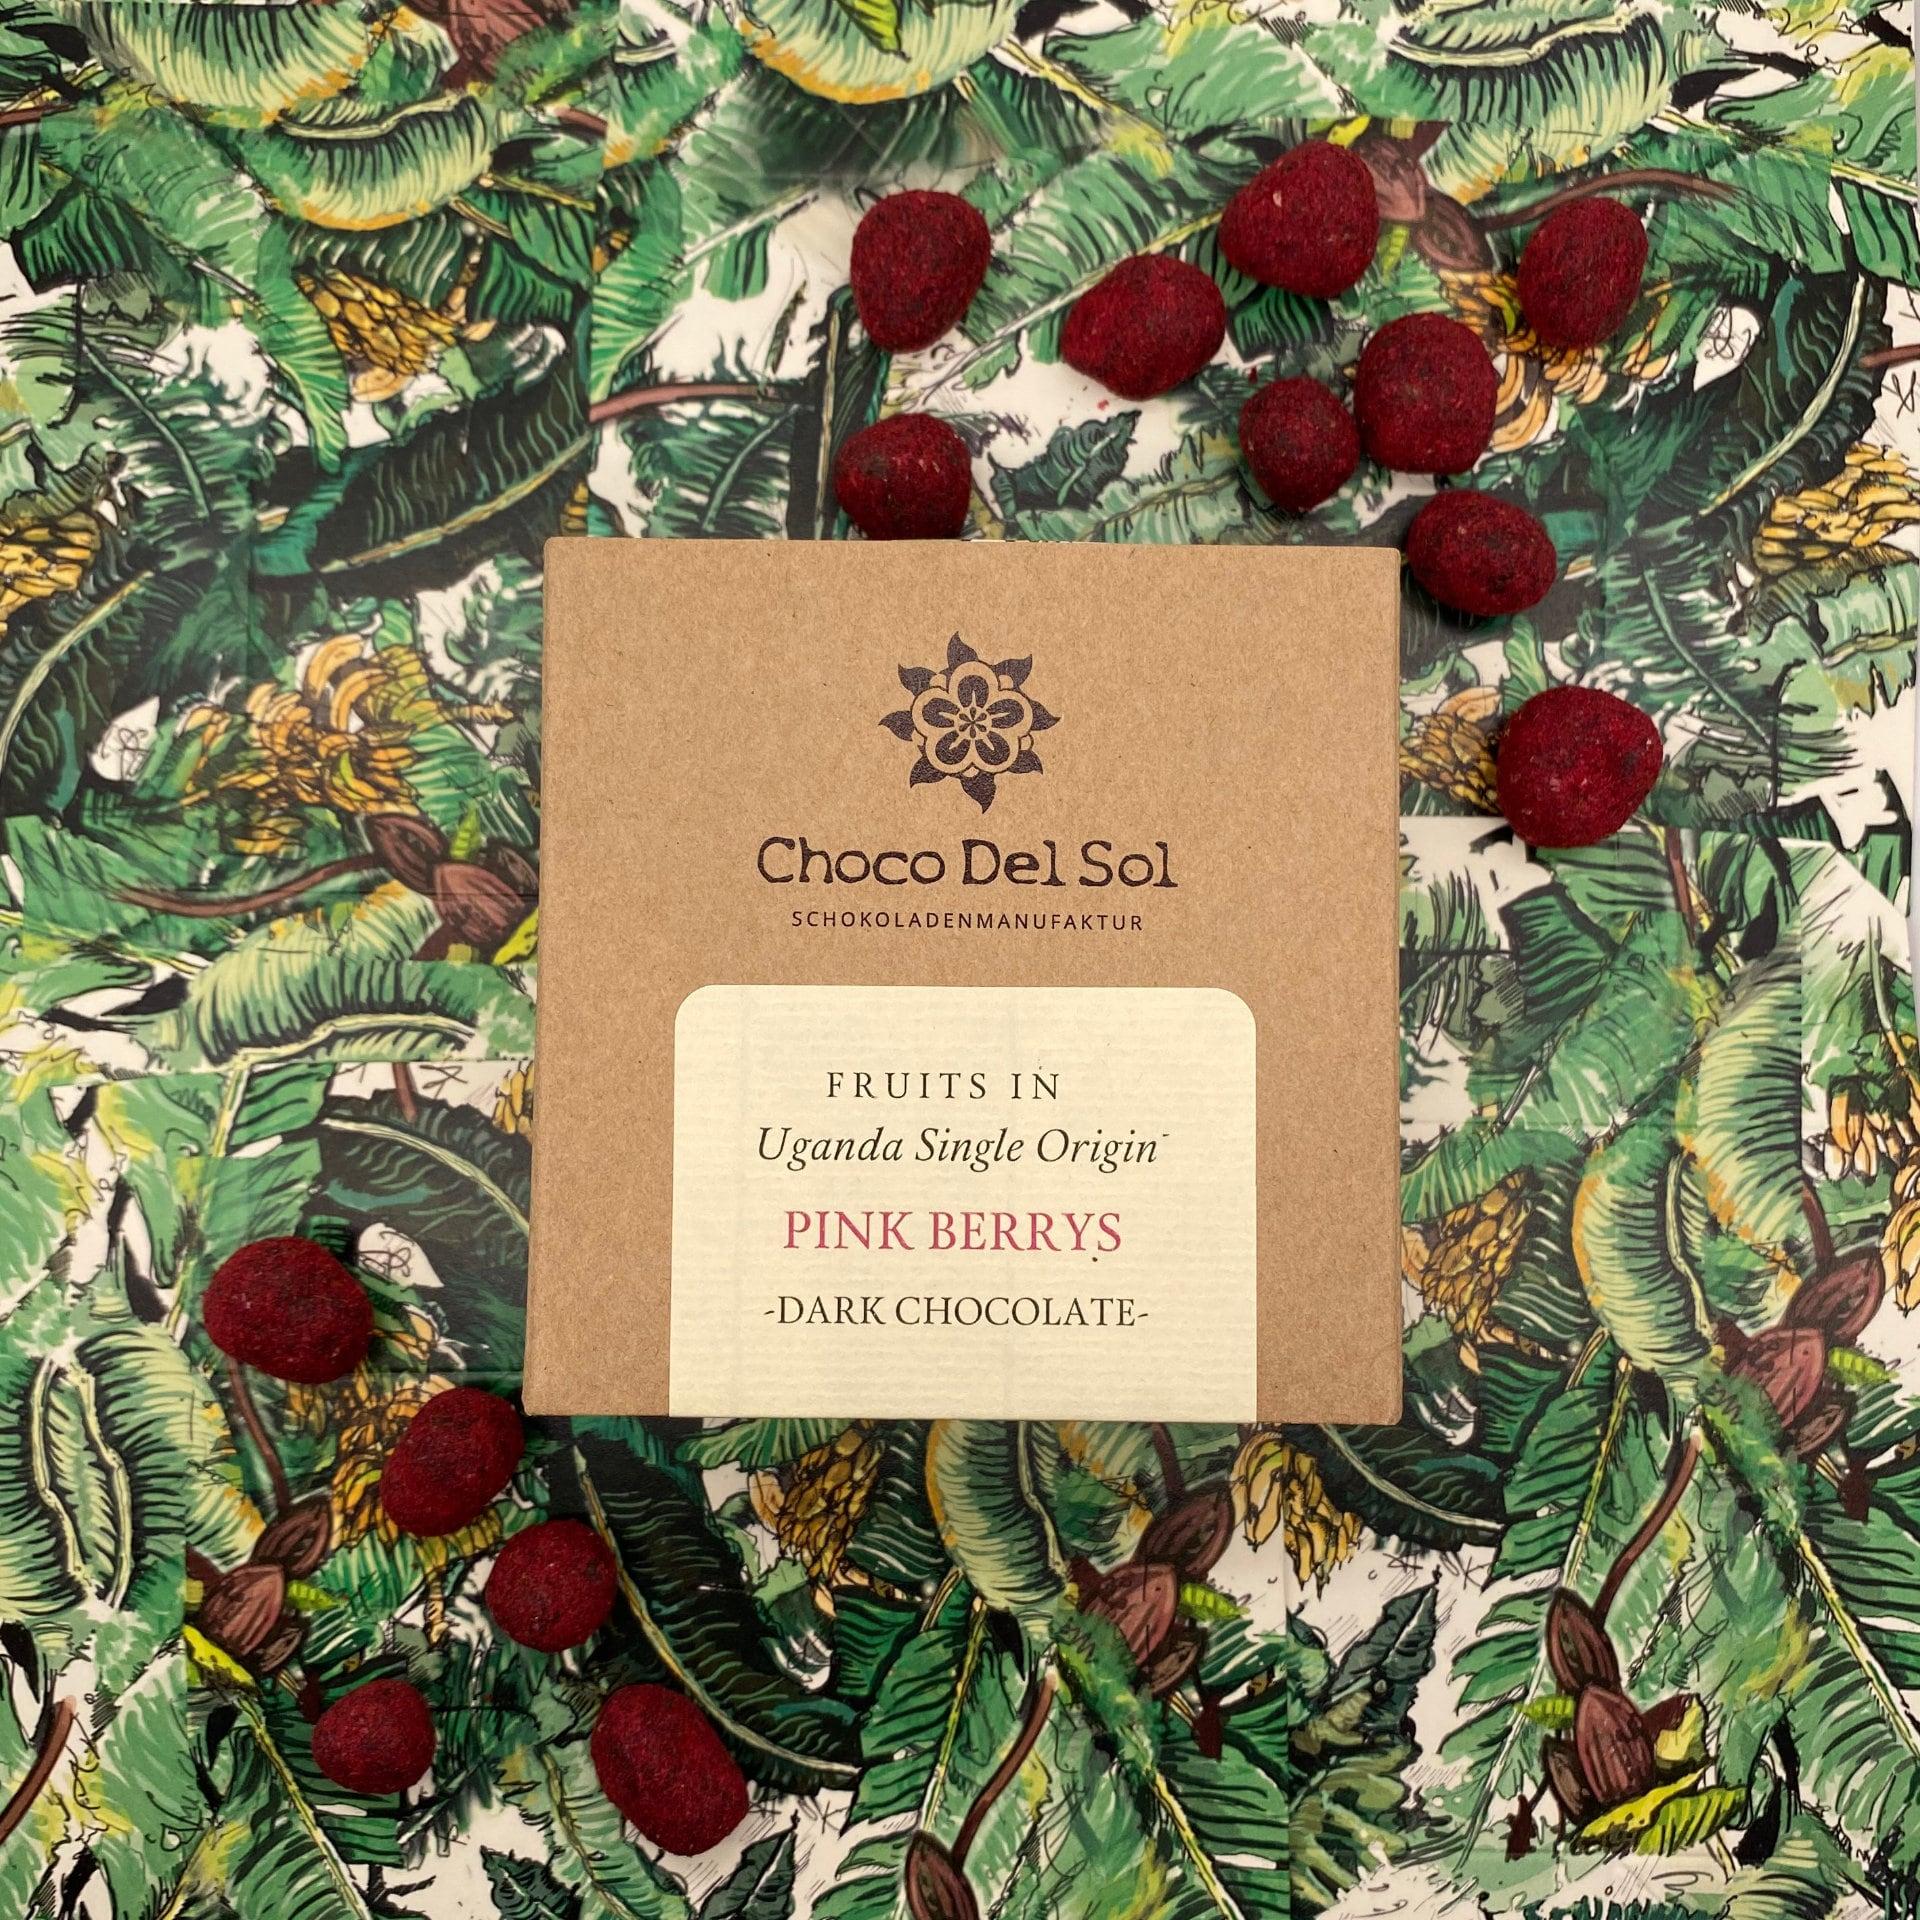 CHOCO DEL SOL | Schokoladendragees Rote Früchte »Pink Berries« 78% | BIO